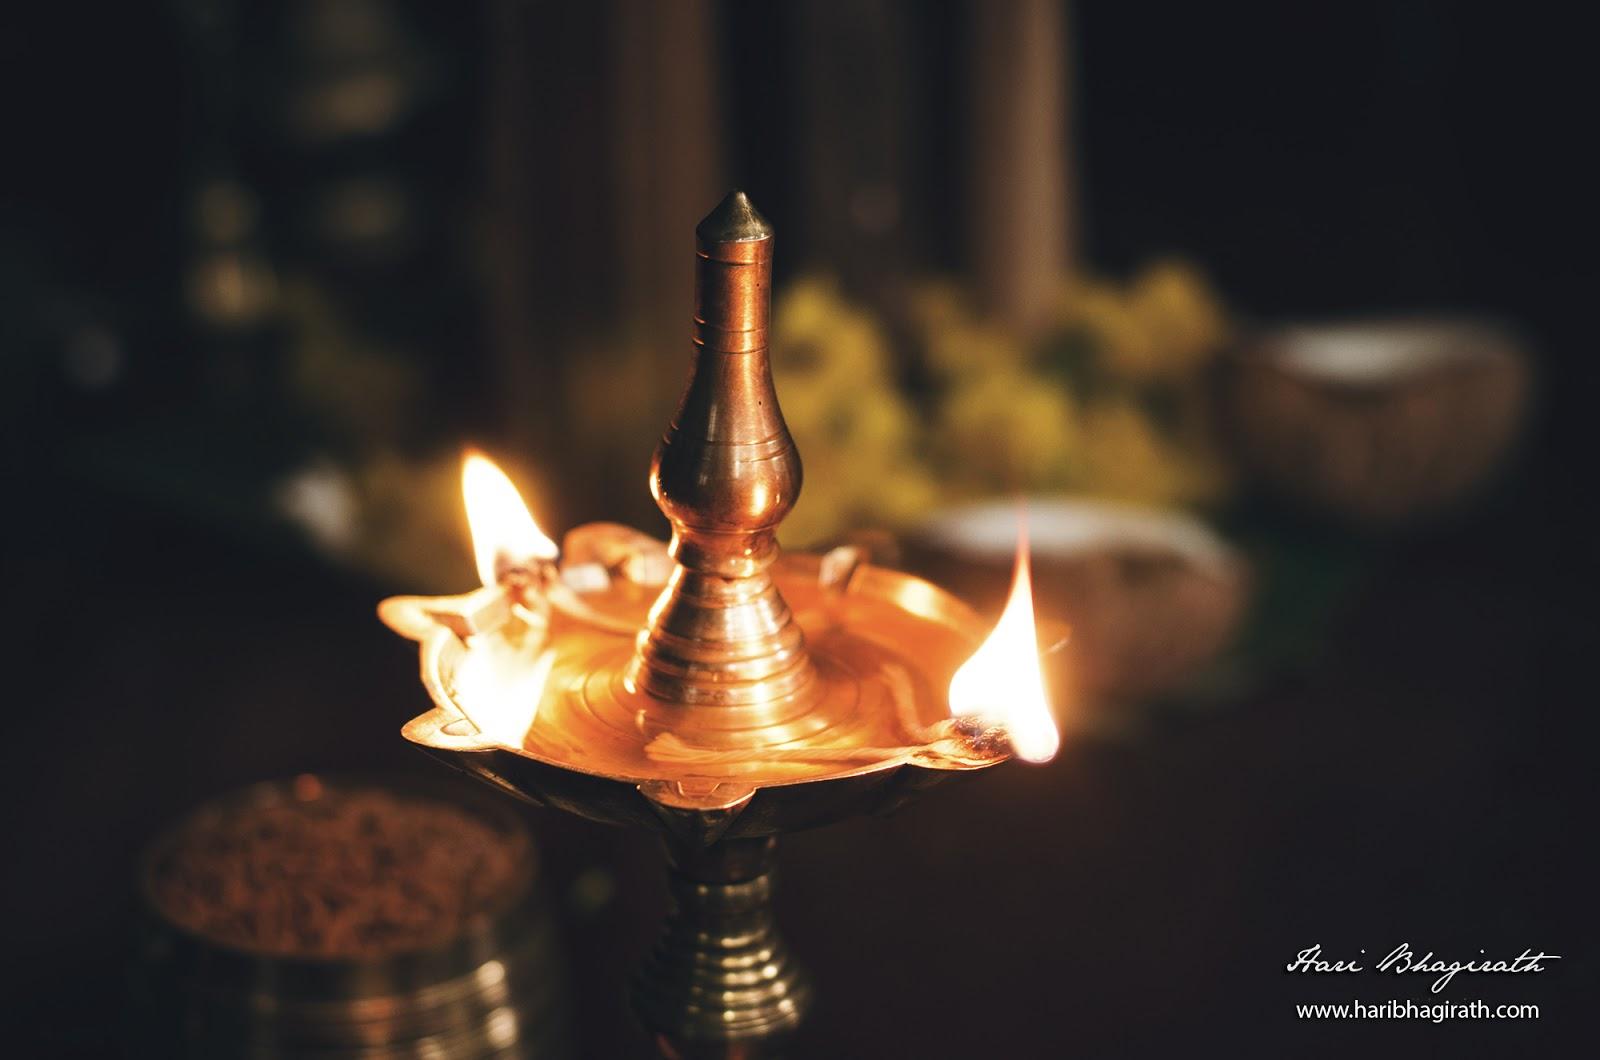 Irinjalakuda: Lighting the Lamp